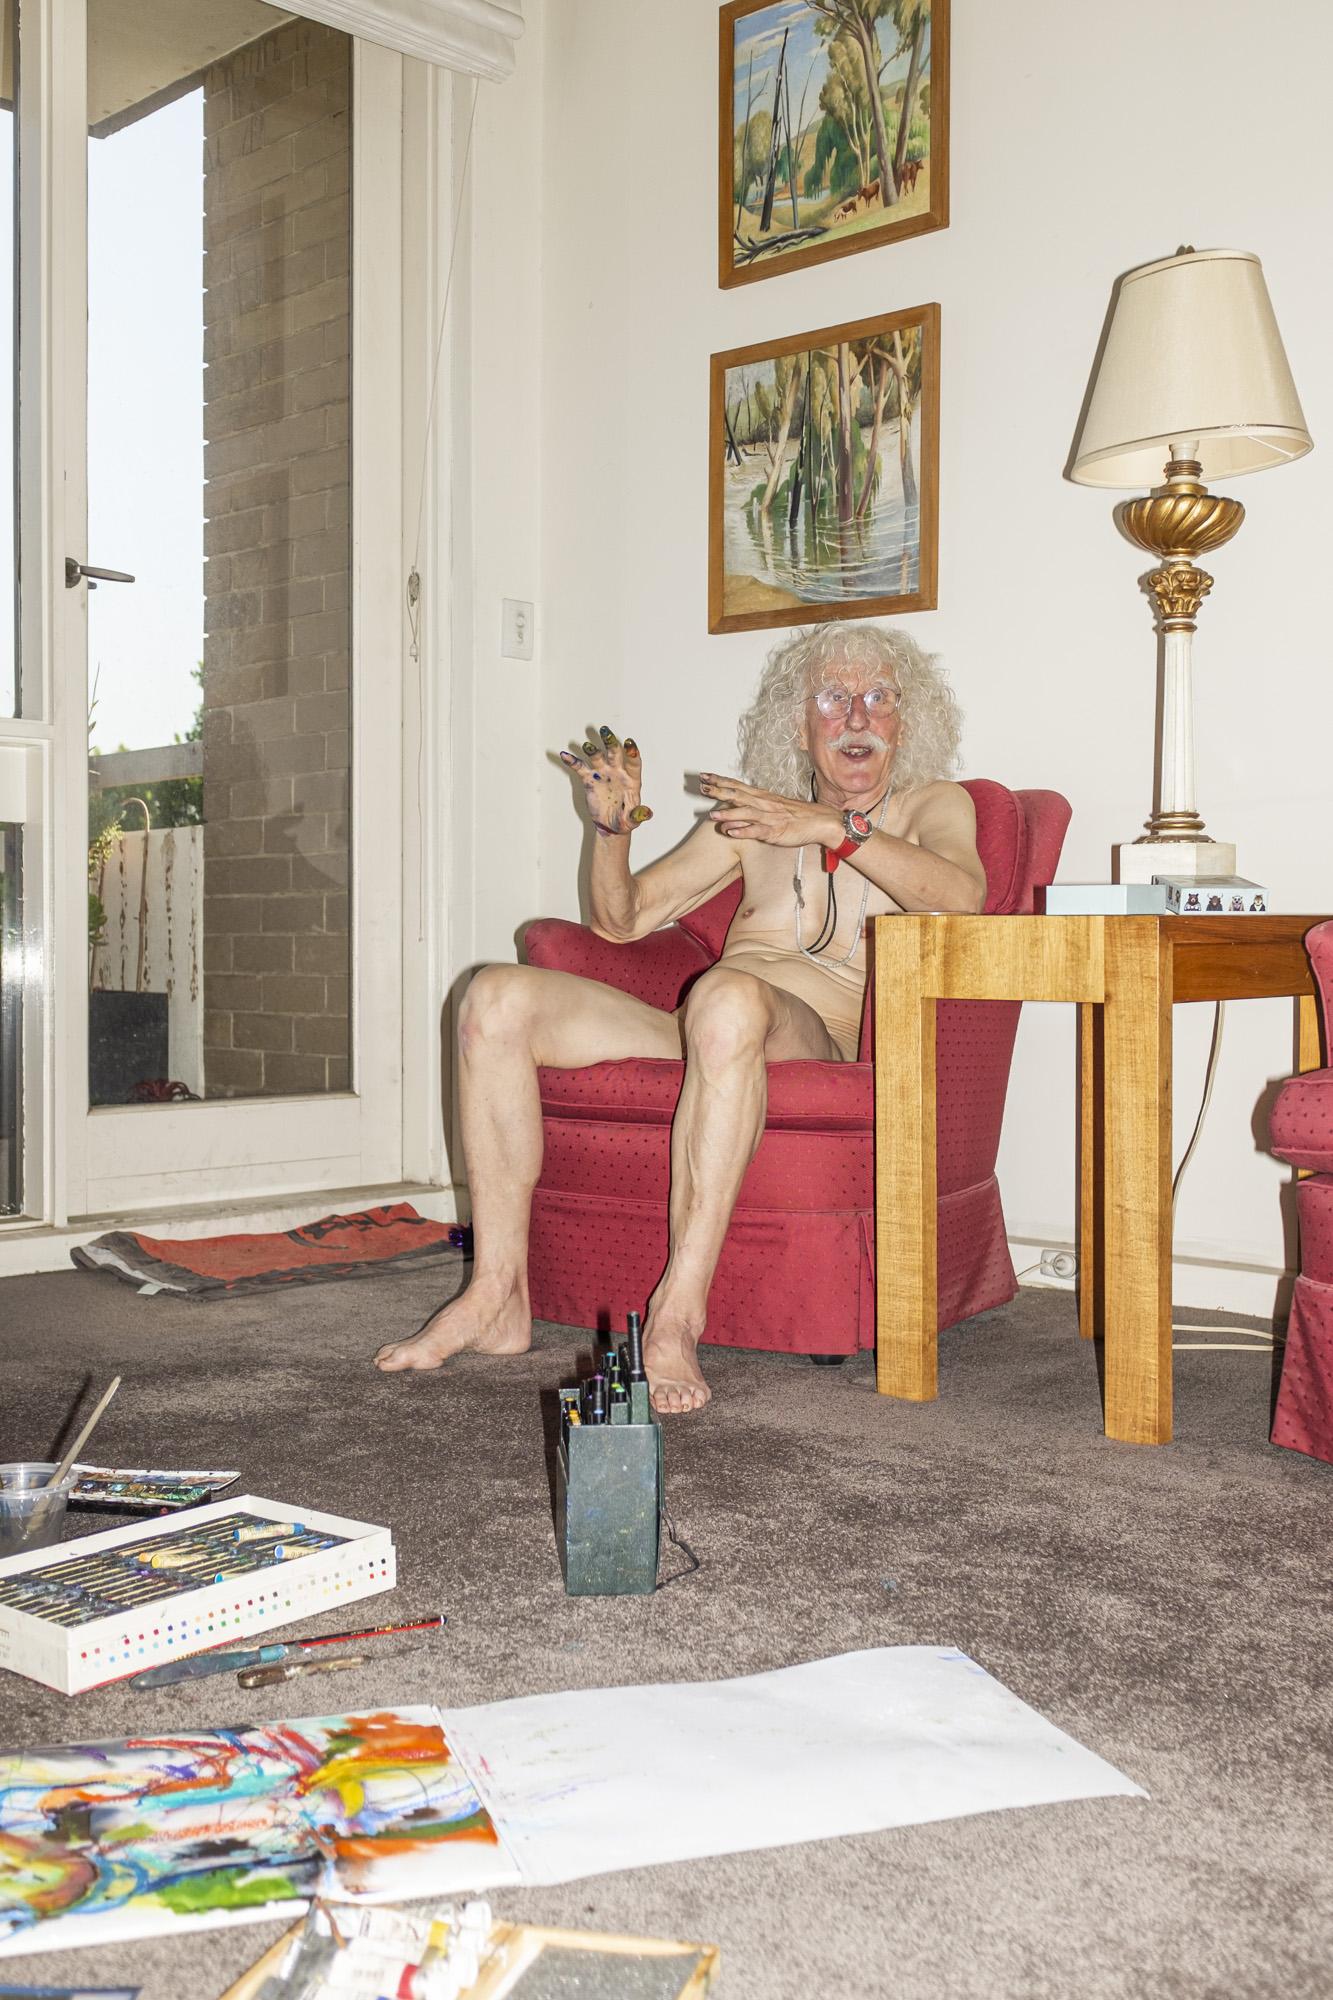 121919_FredrikBengtsson-Copyright_2669